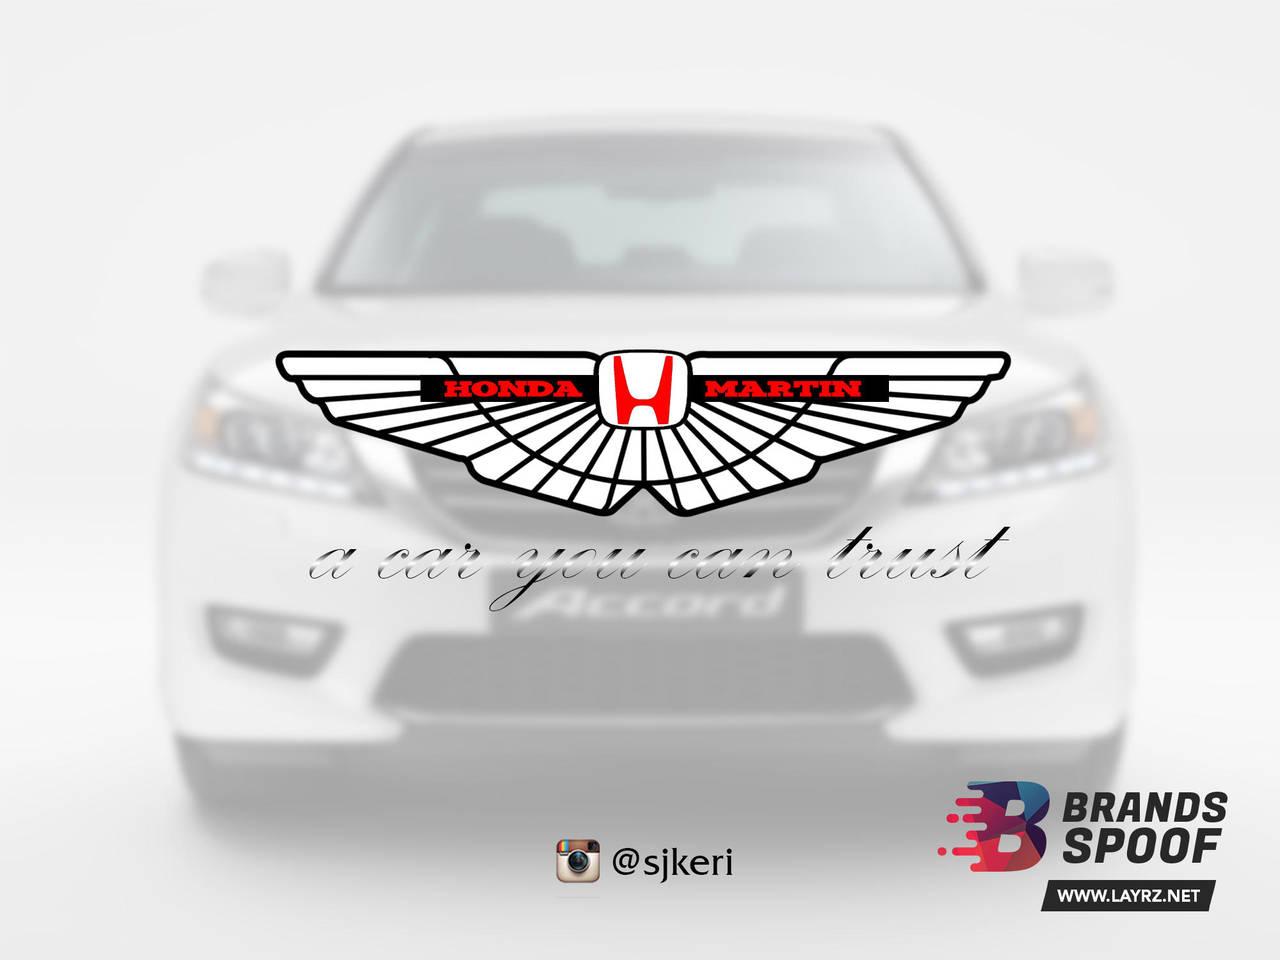 Honda Martin Spoof by sjkeri